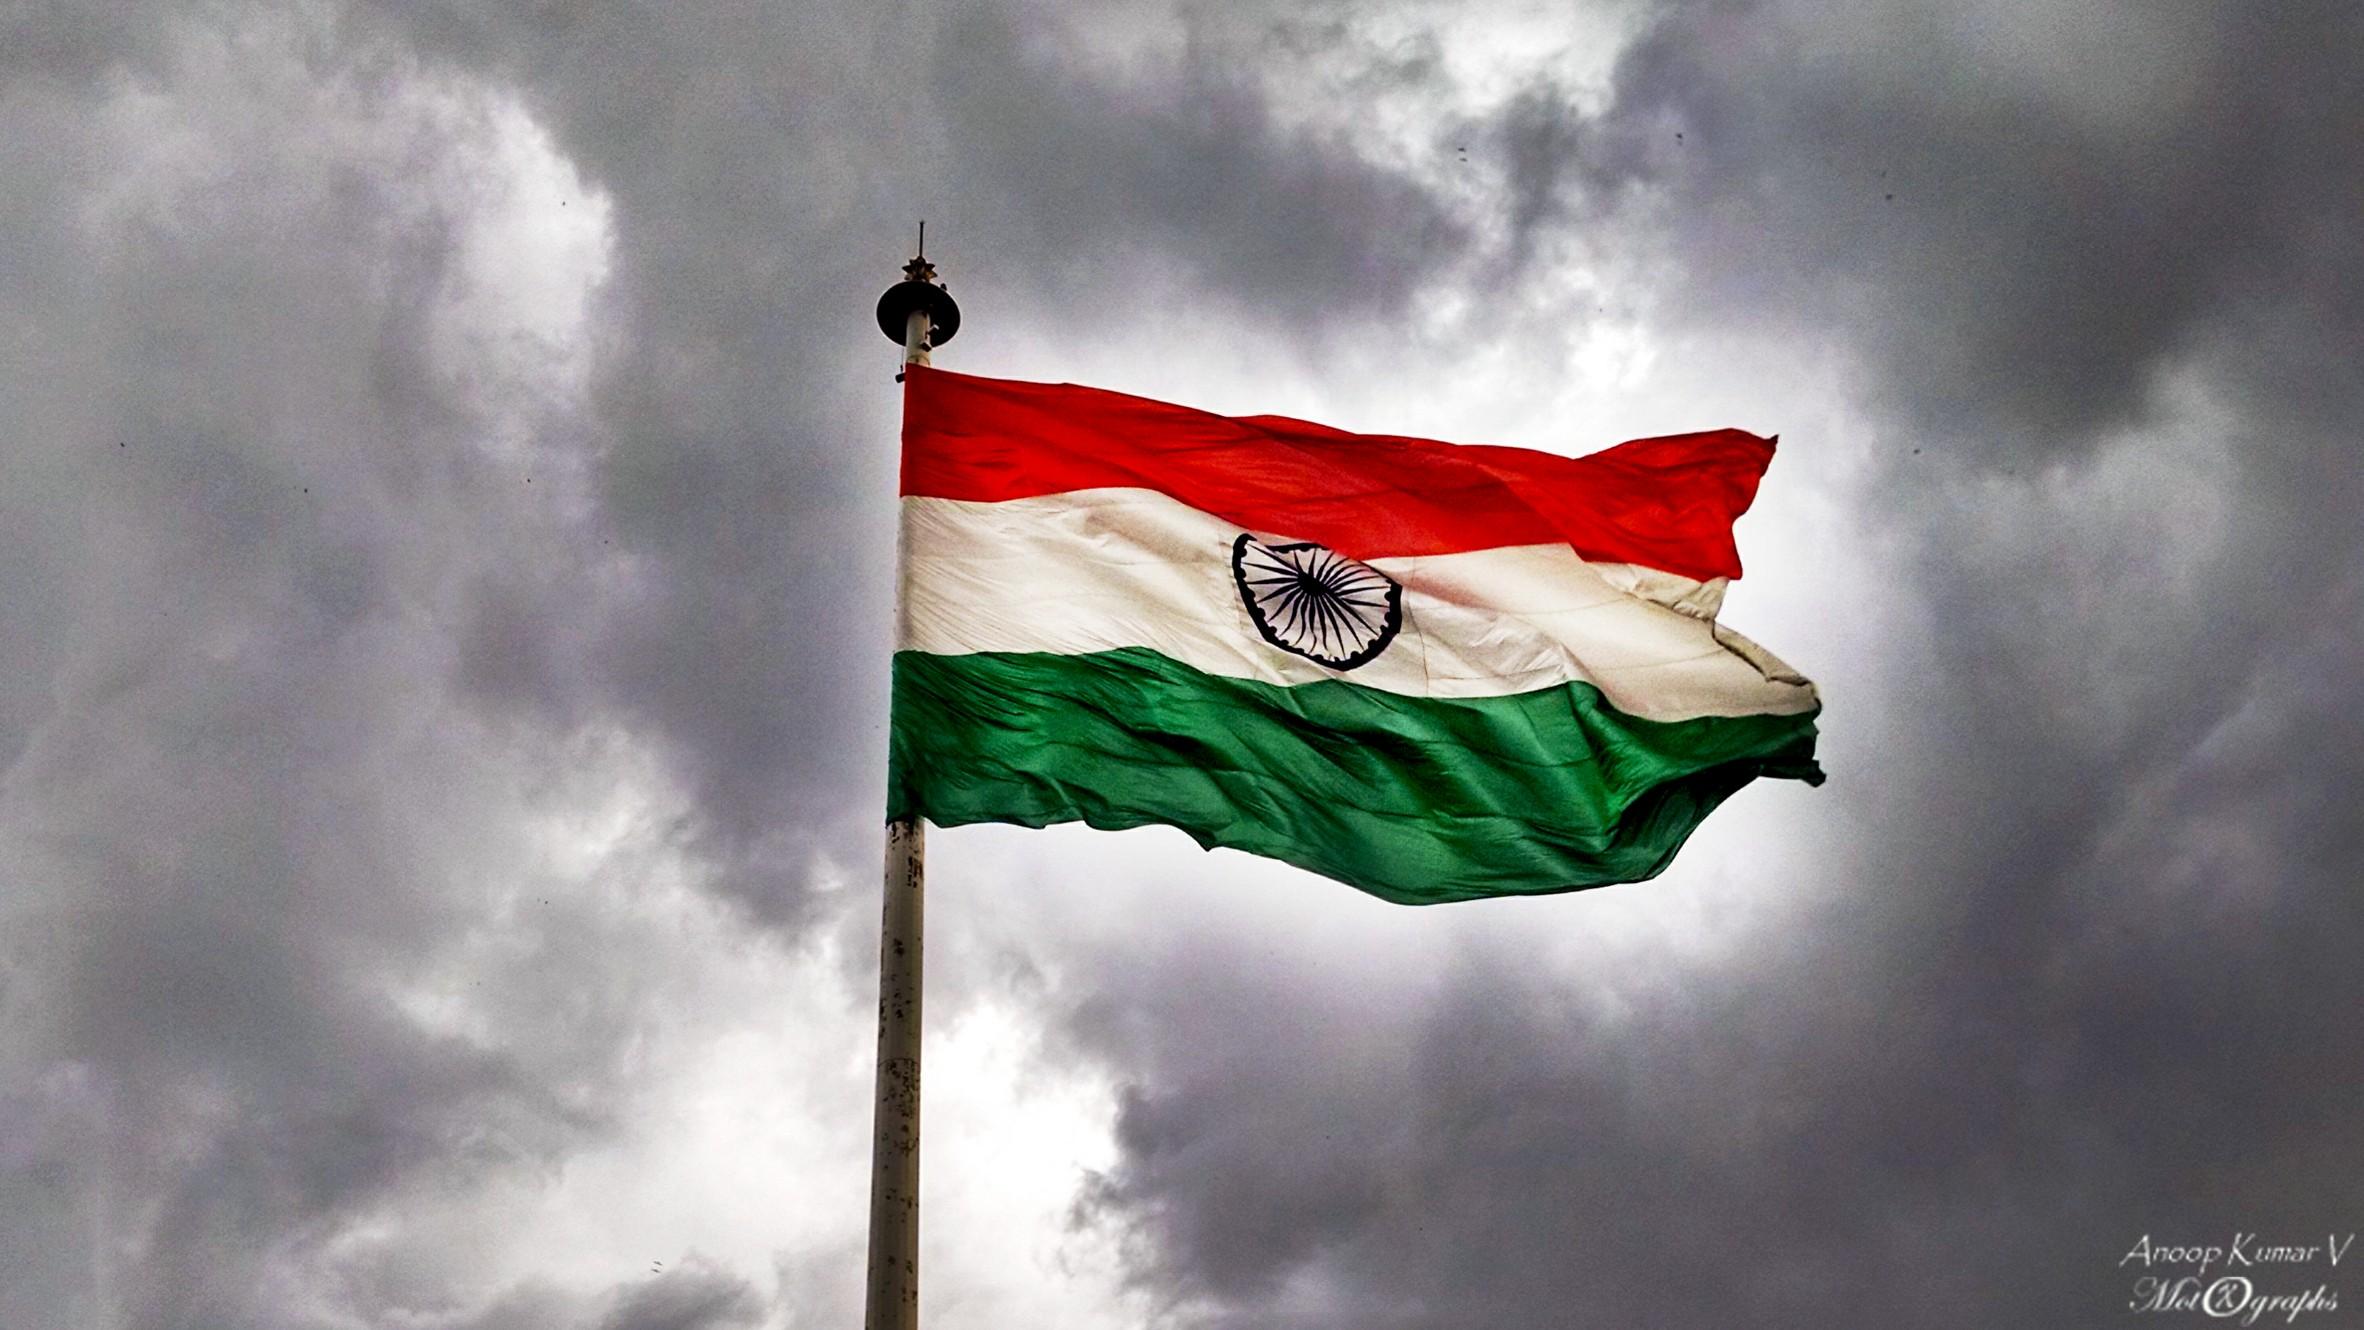 Indian Flag Flying Wallpaper: The 'Tiranga' (National Flag Of India) Flying Bright